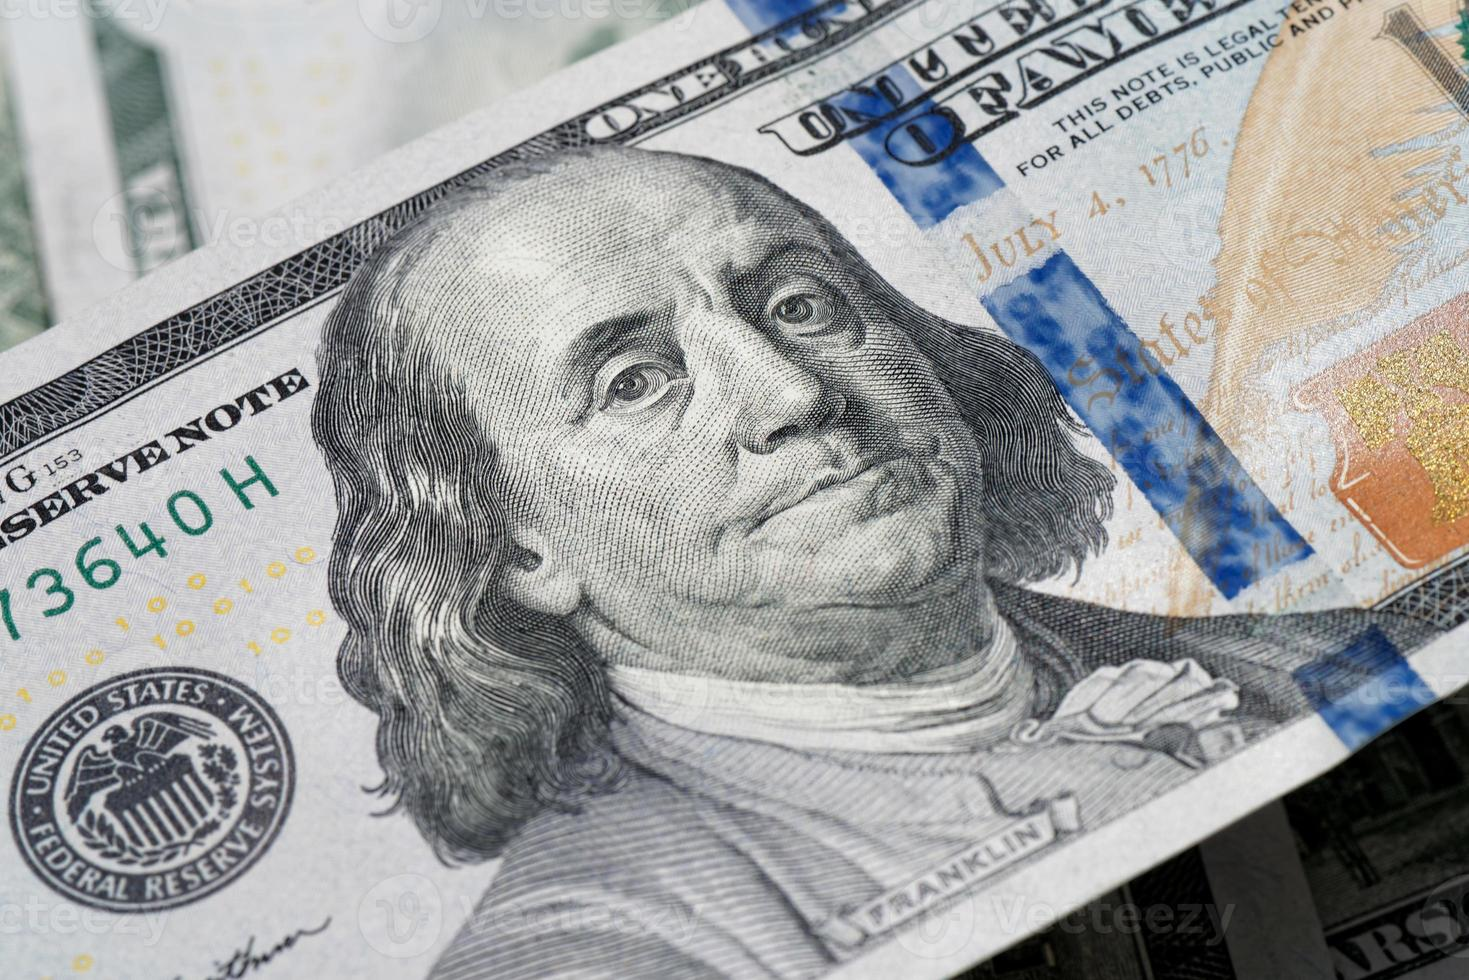 Benjamin Franklin 100 dollar bill photo